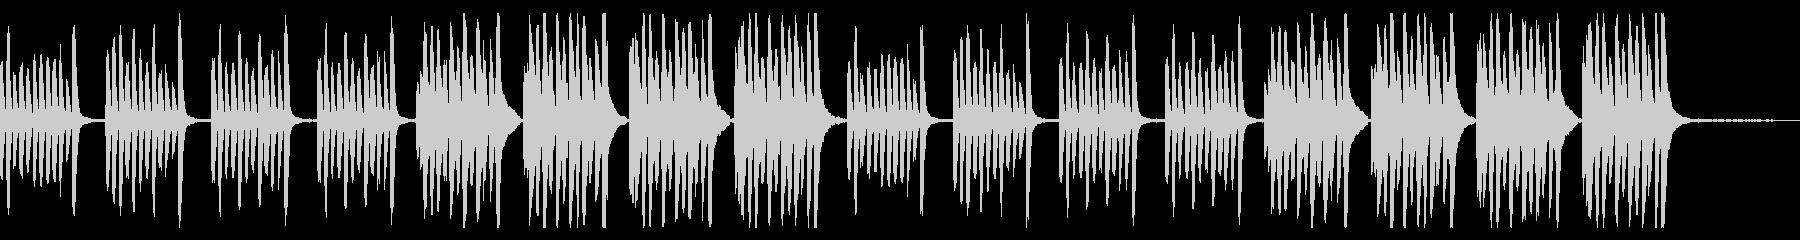 【youtube】ピアノの日常系BGMの未再生の波形